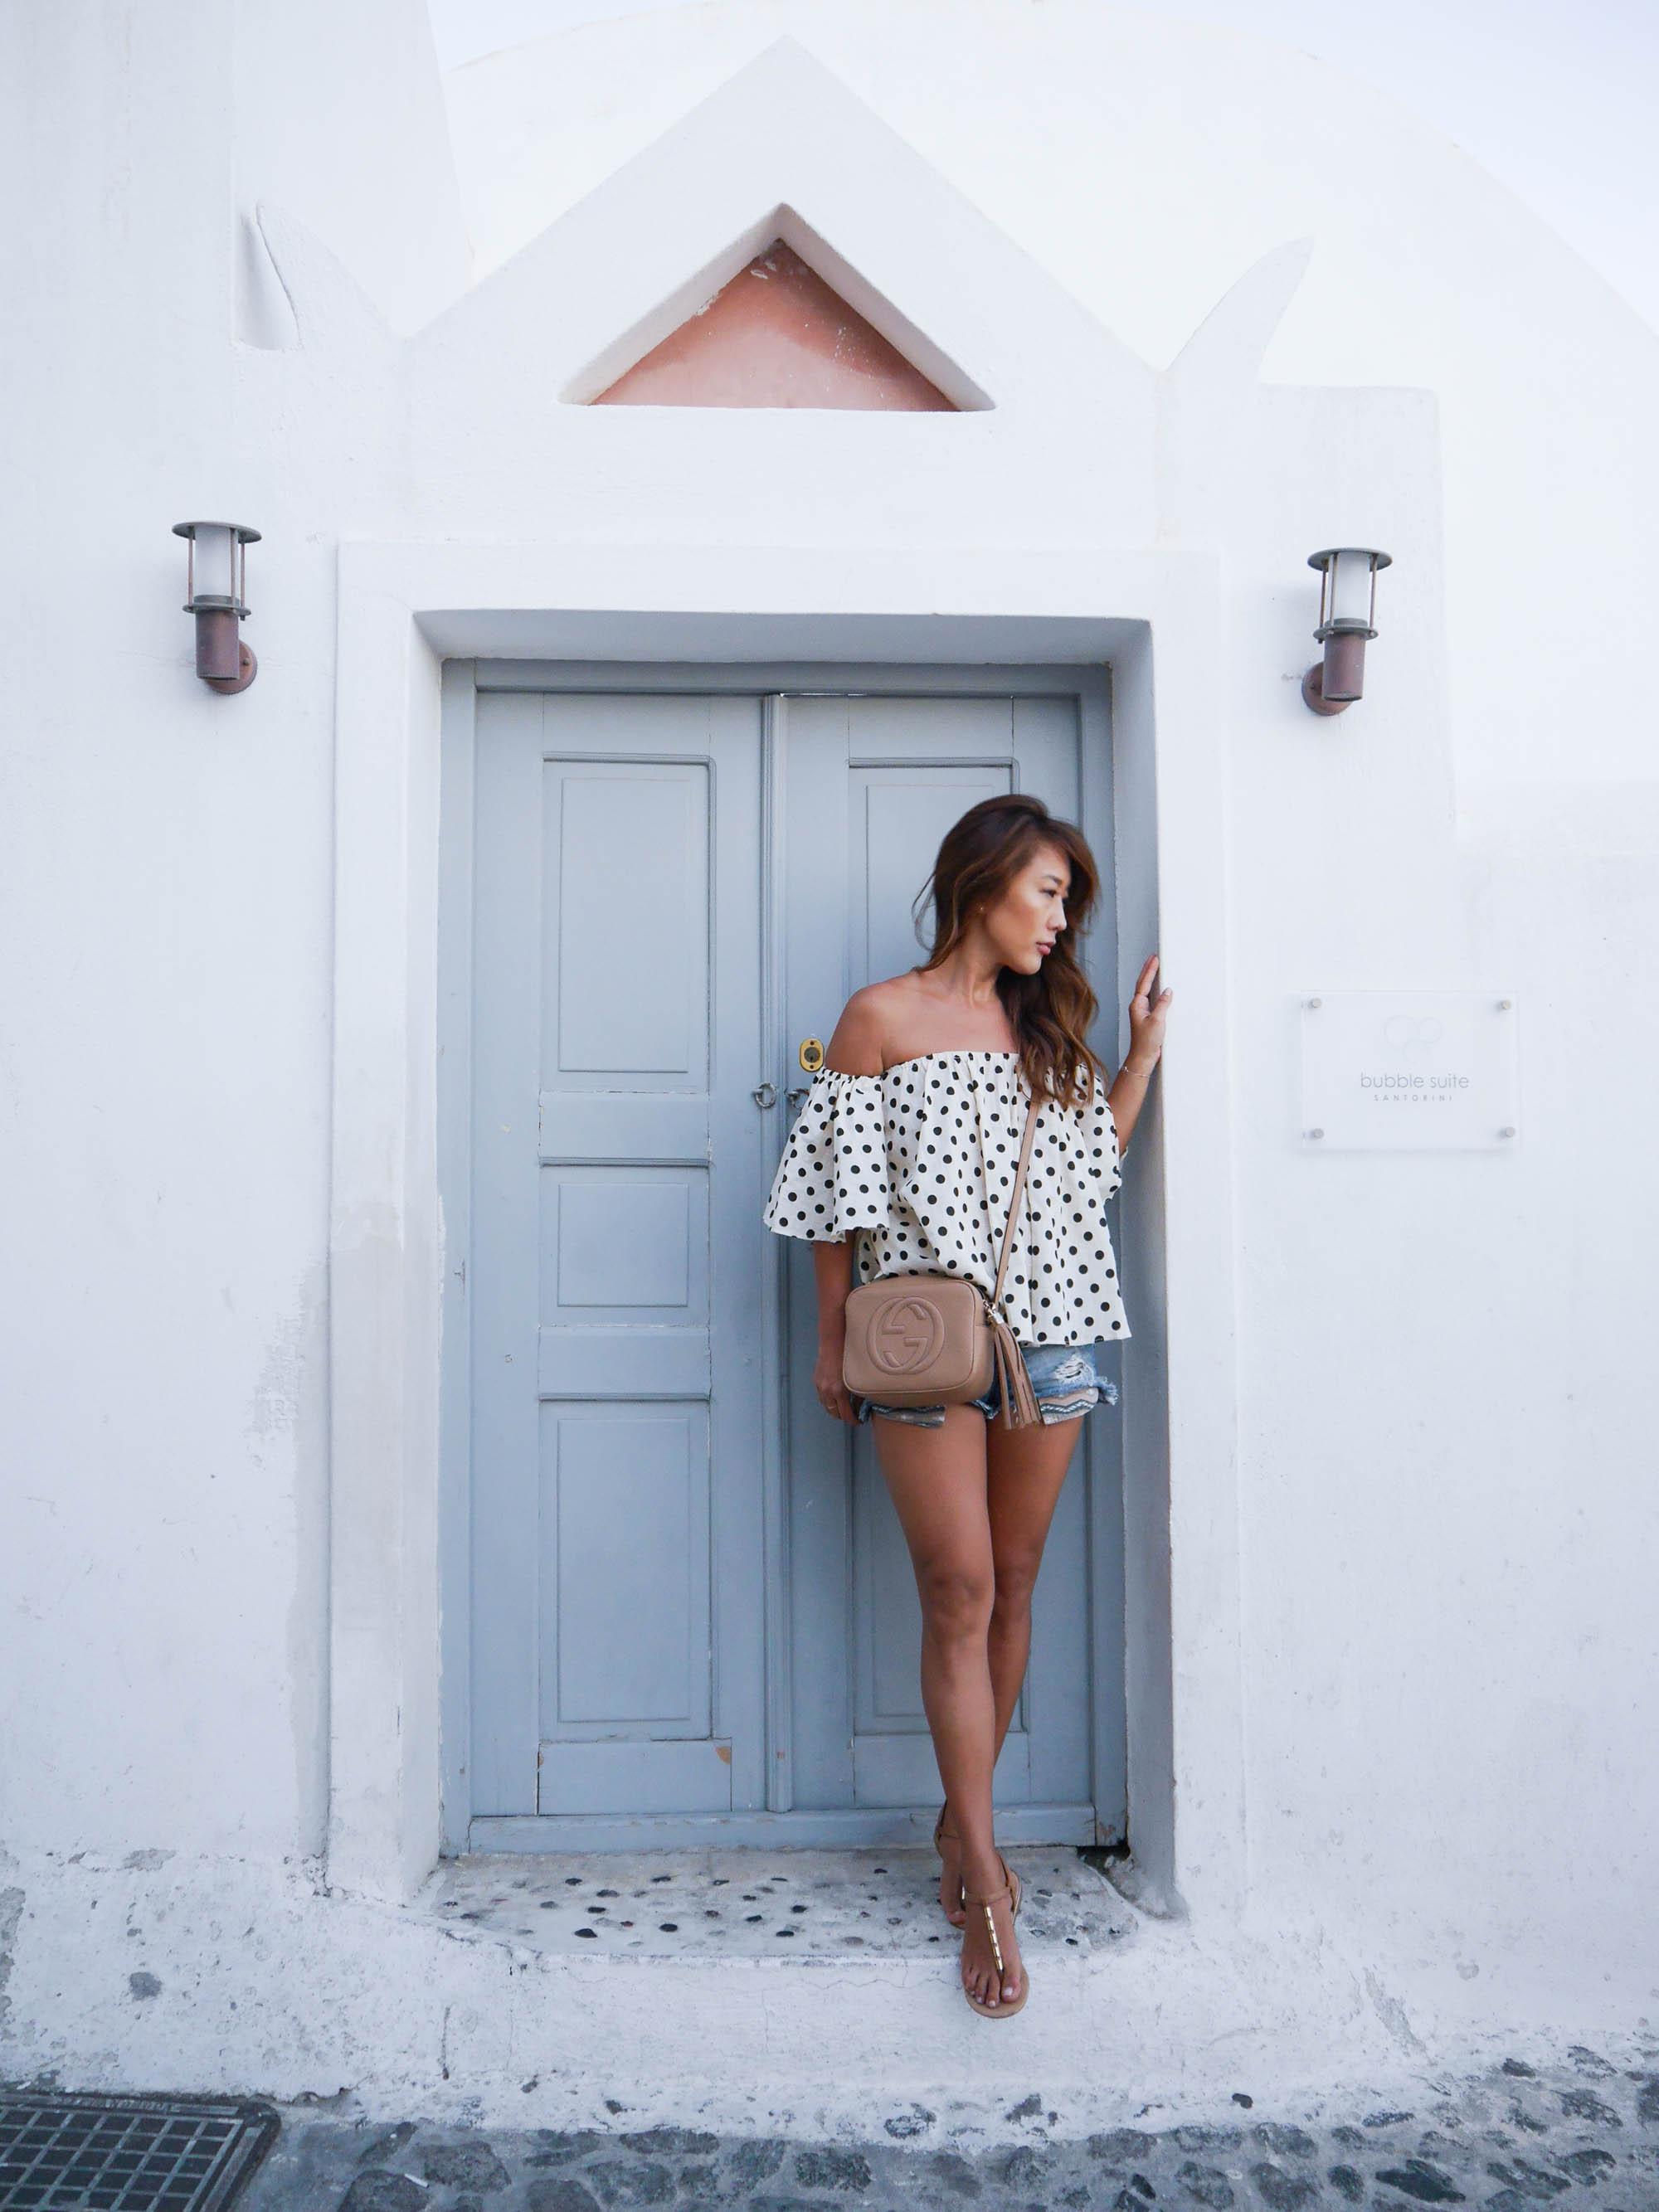 theclassycloud-santorini-travel-outfits (8 von 9)